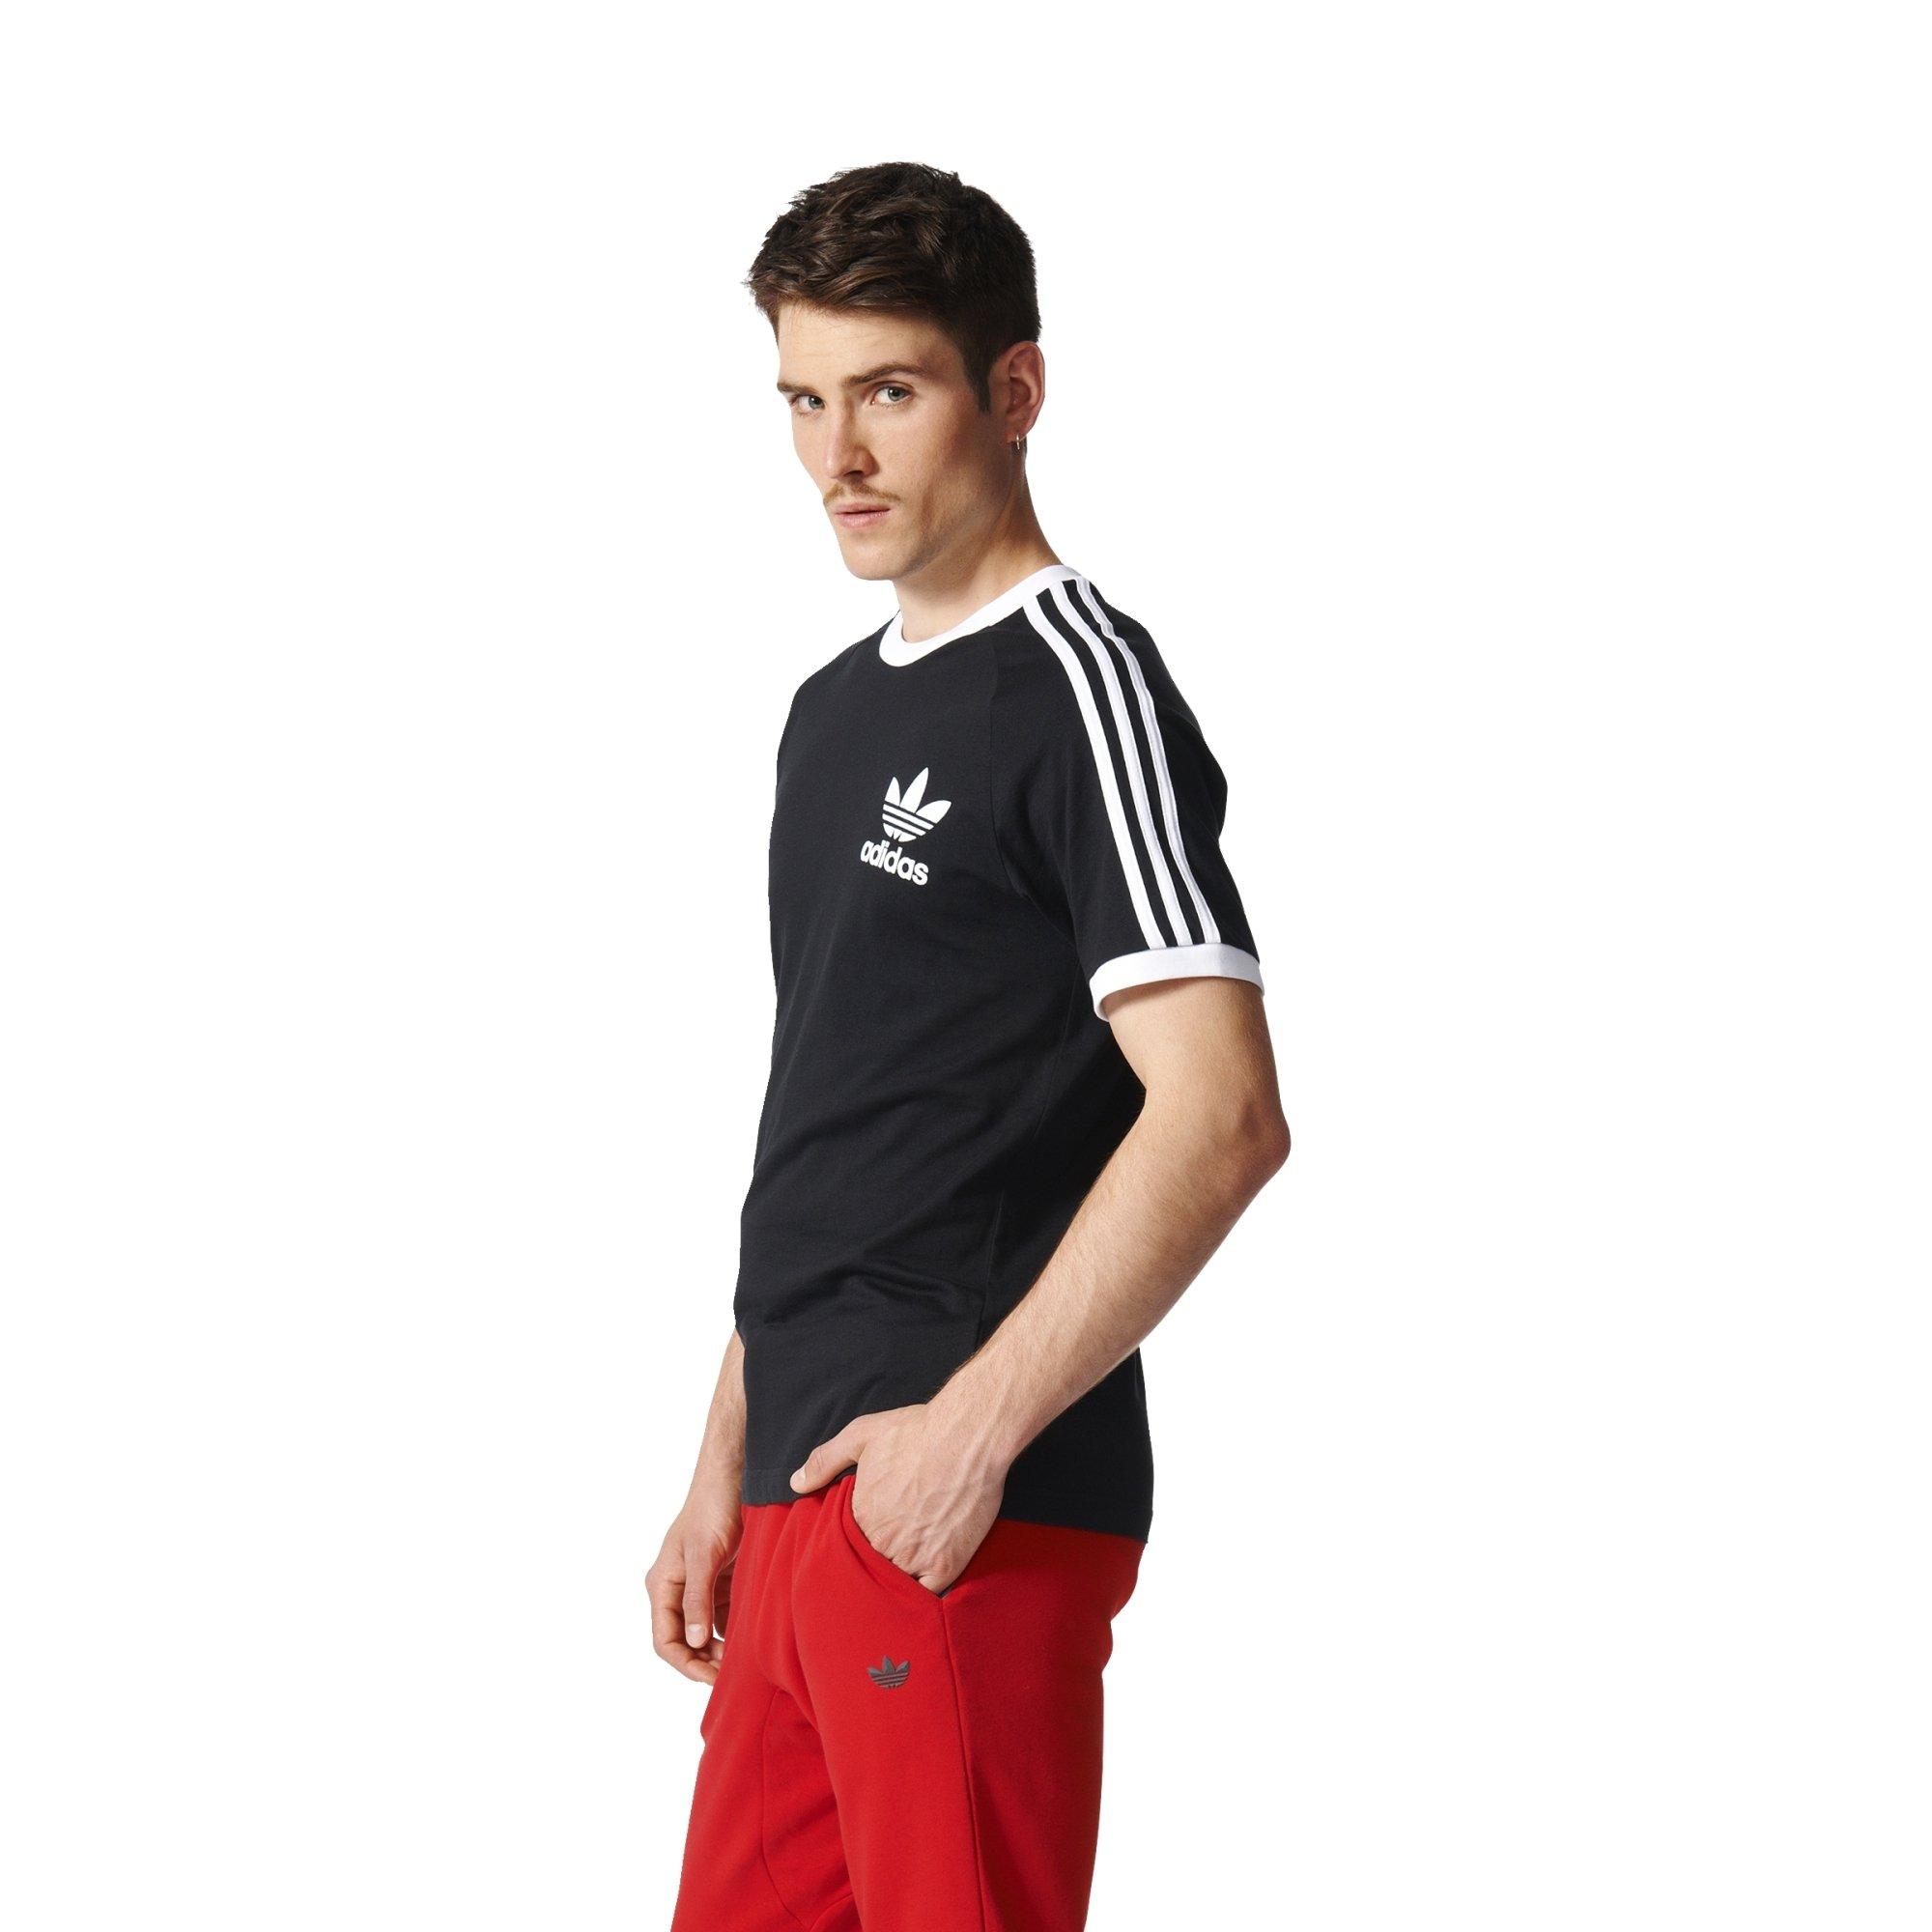 c262591d Adidas Men's Tops California Tee, Black, Small. by adidas Originals